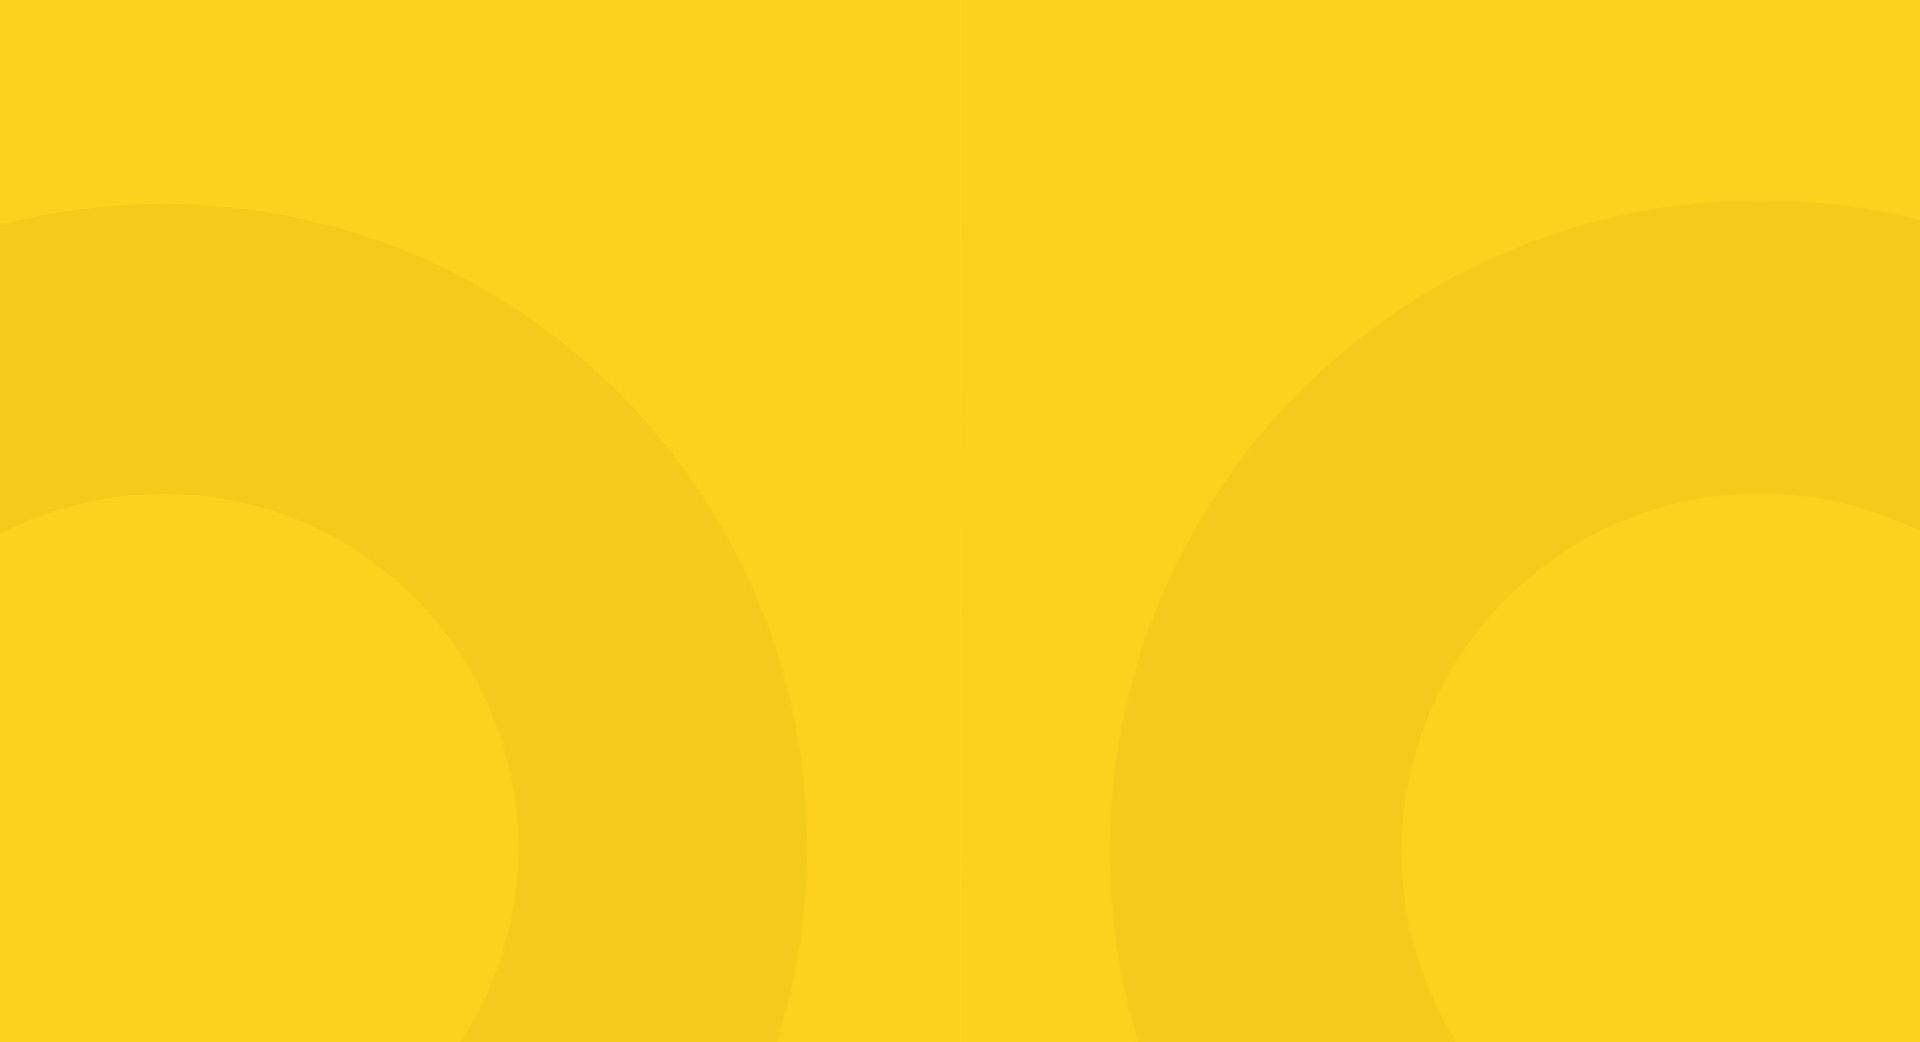 background-yellow